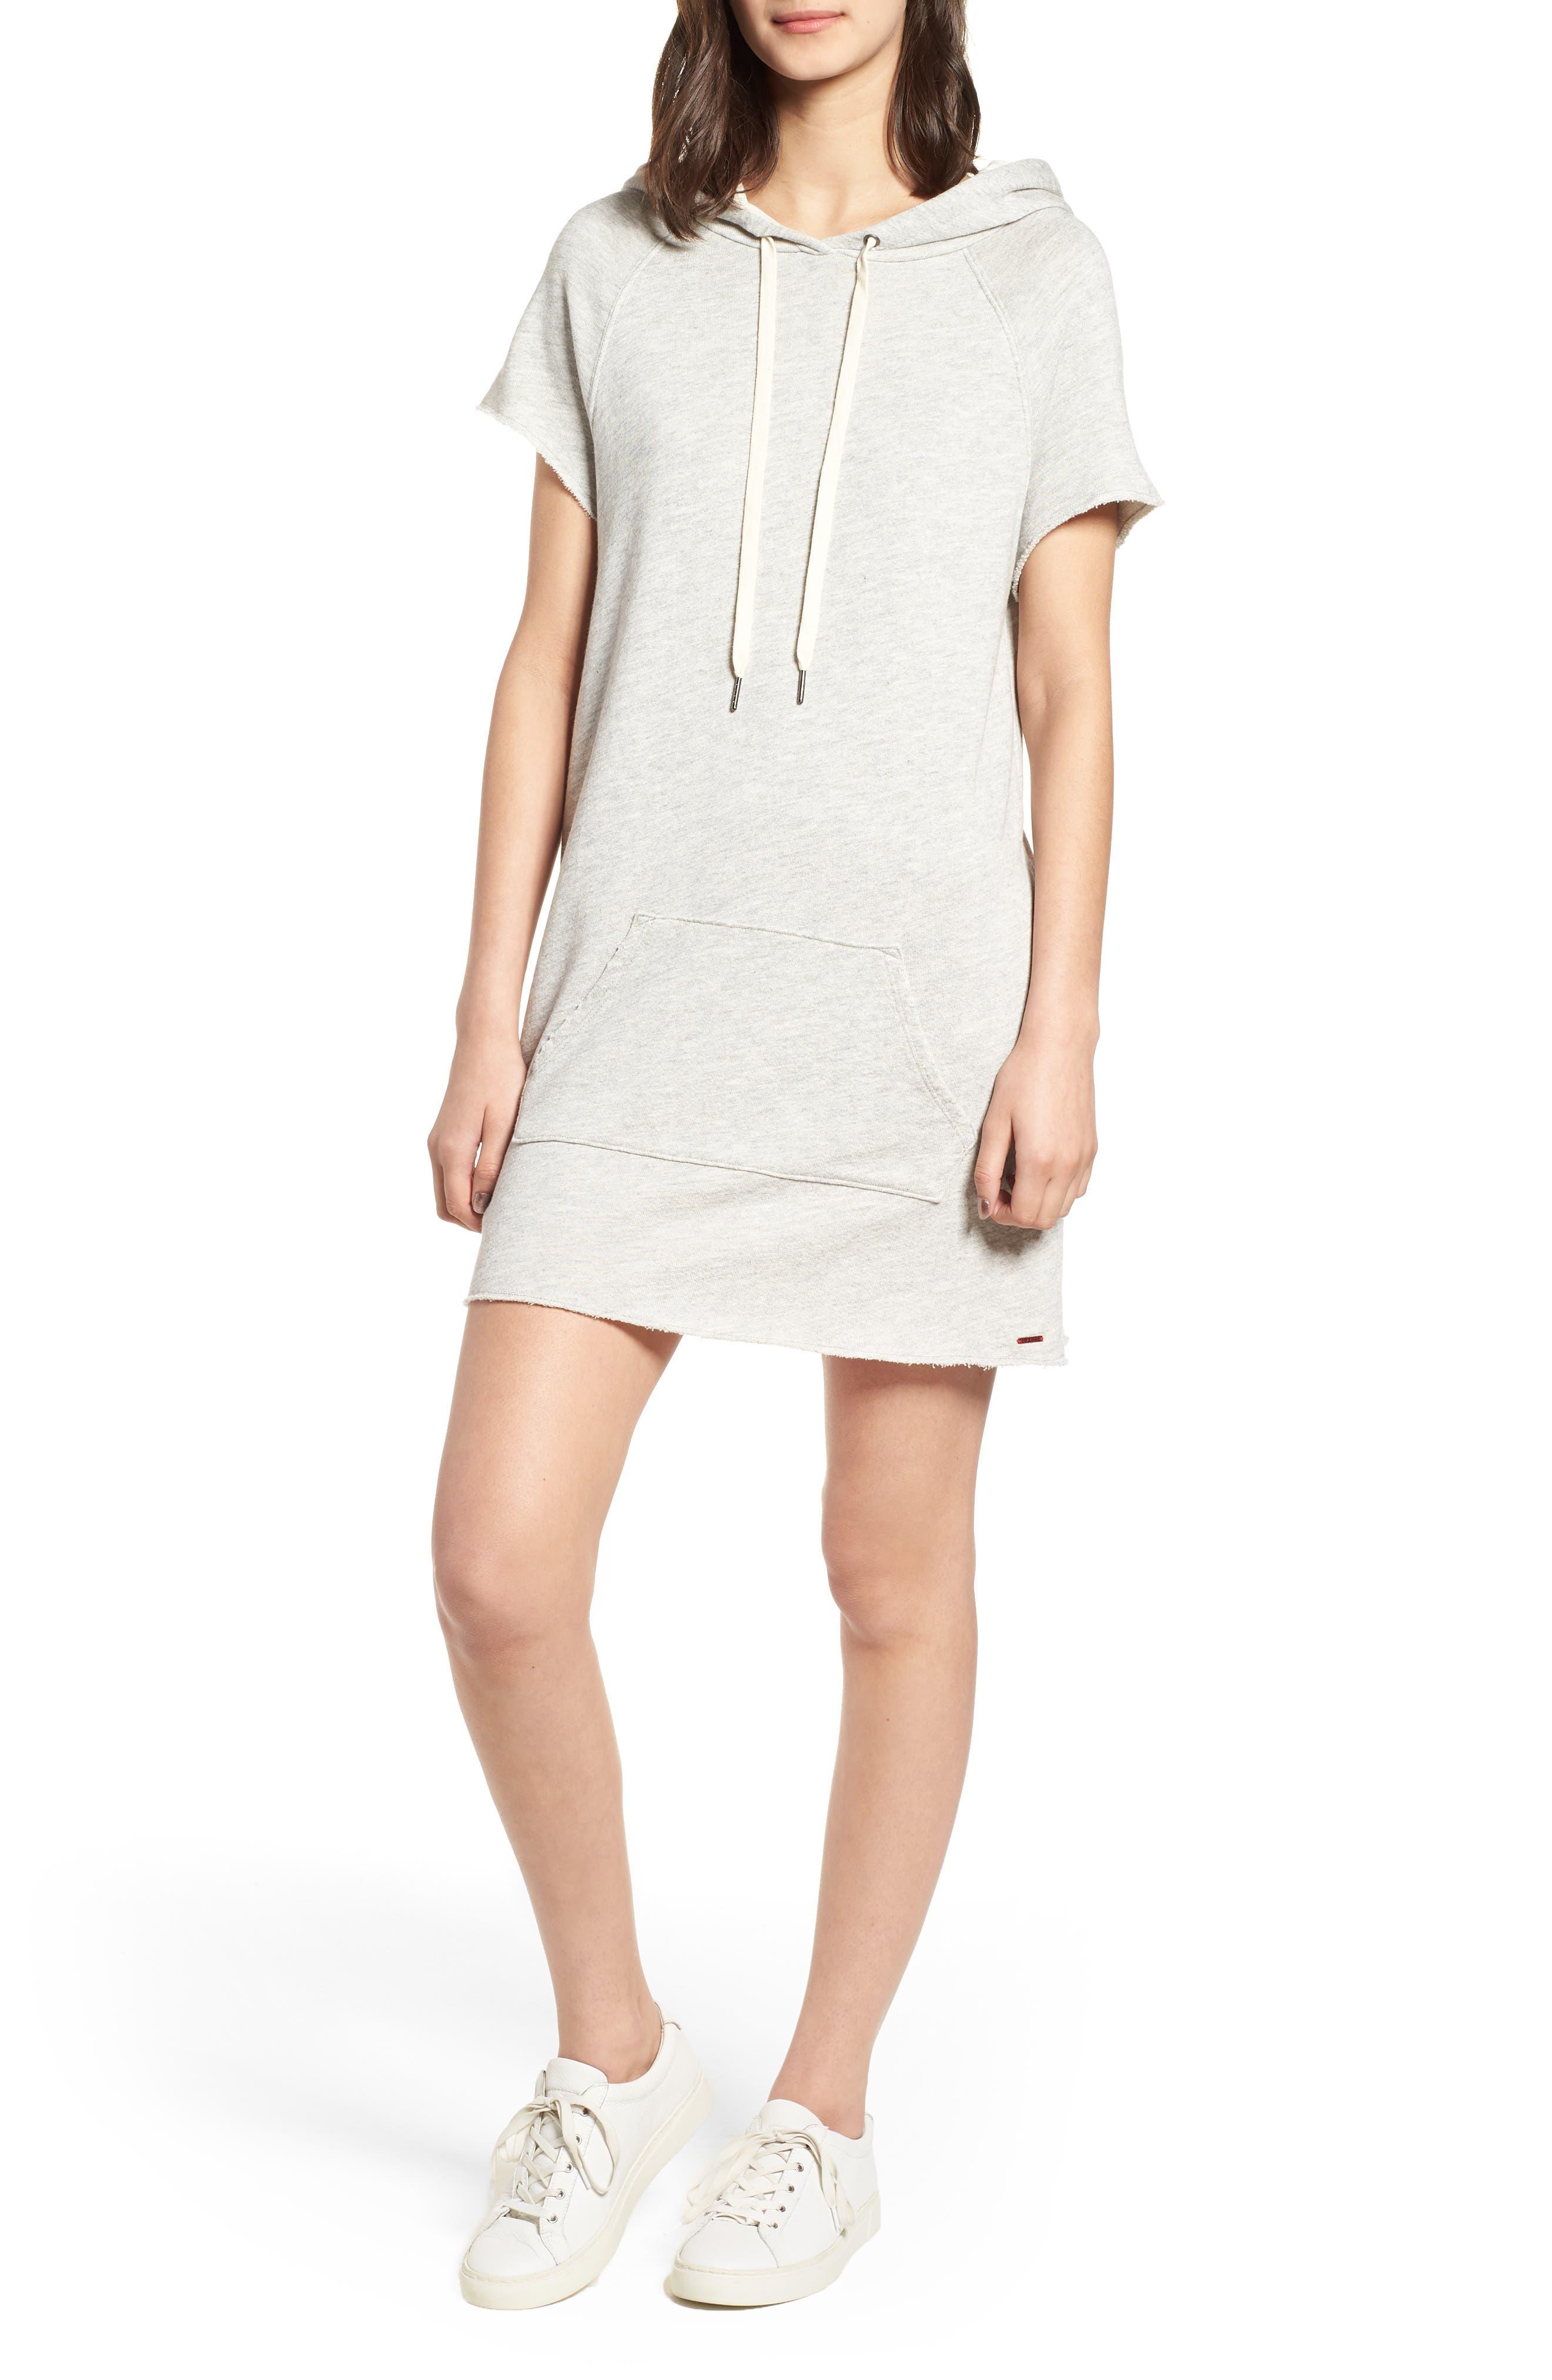 Spades Hoodie Dress,                         Main,                         color, 020